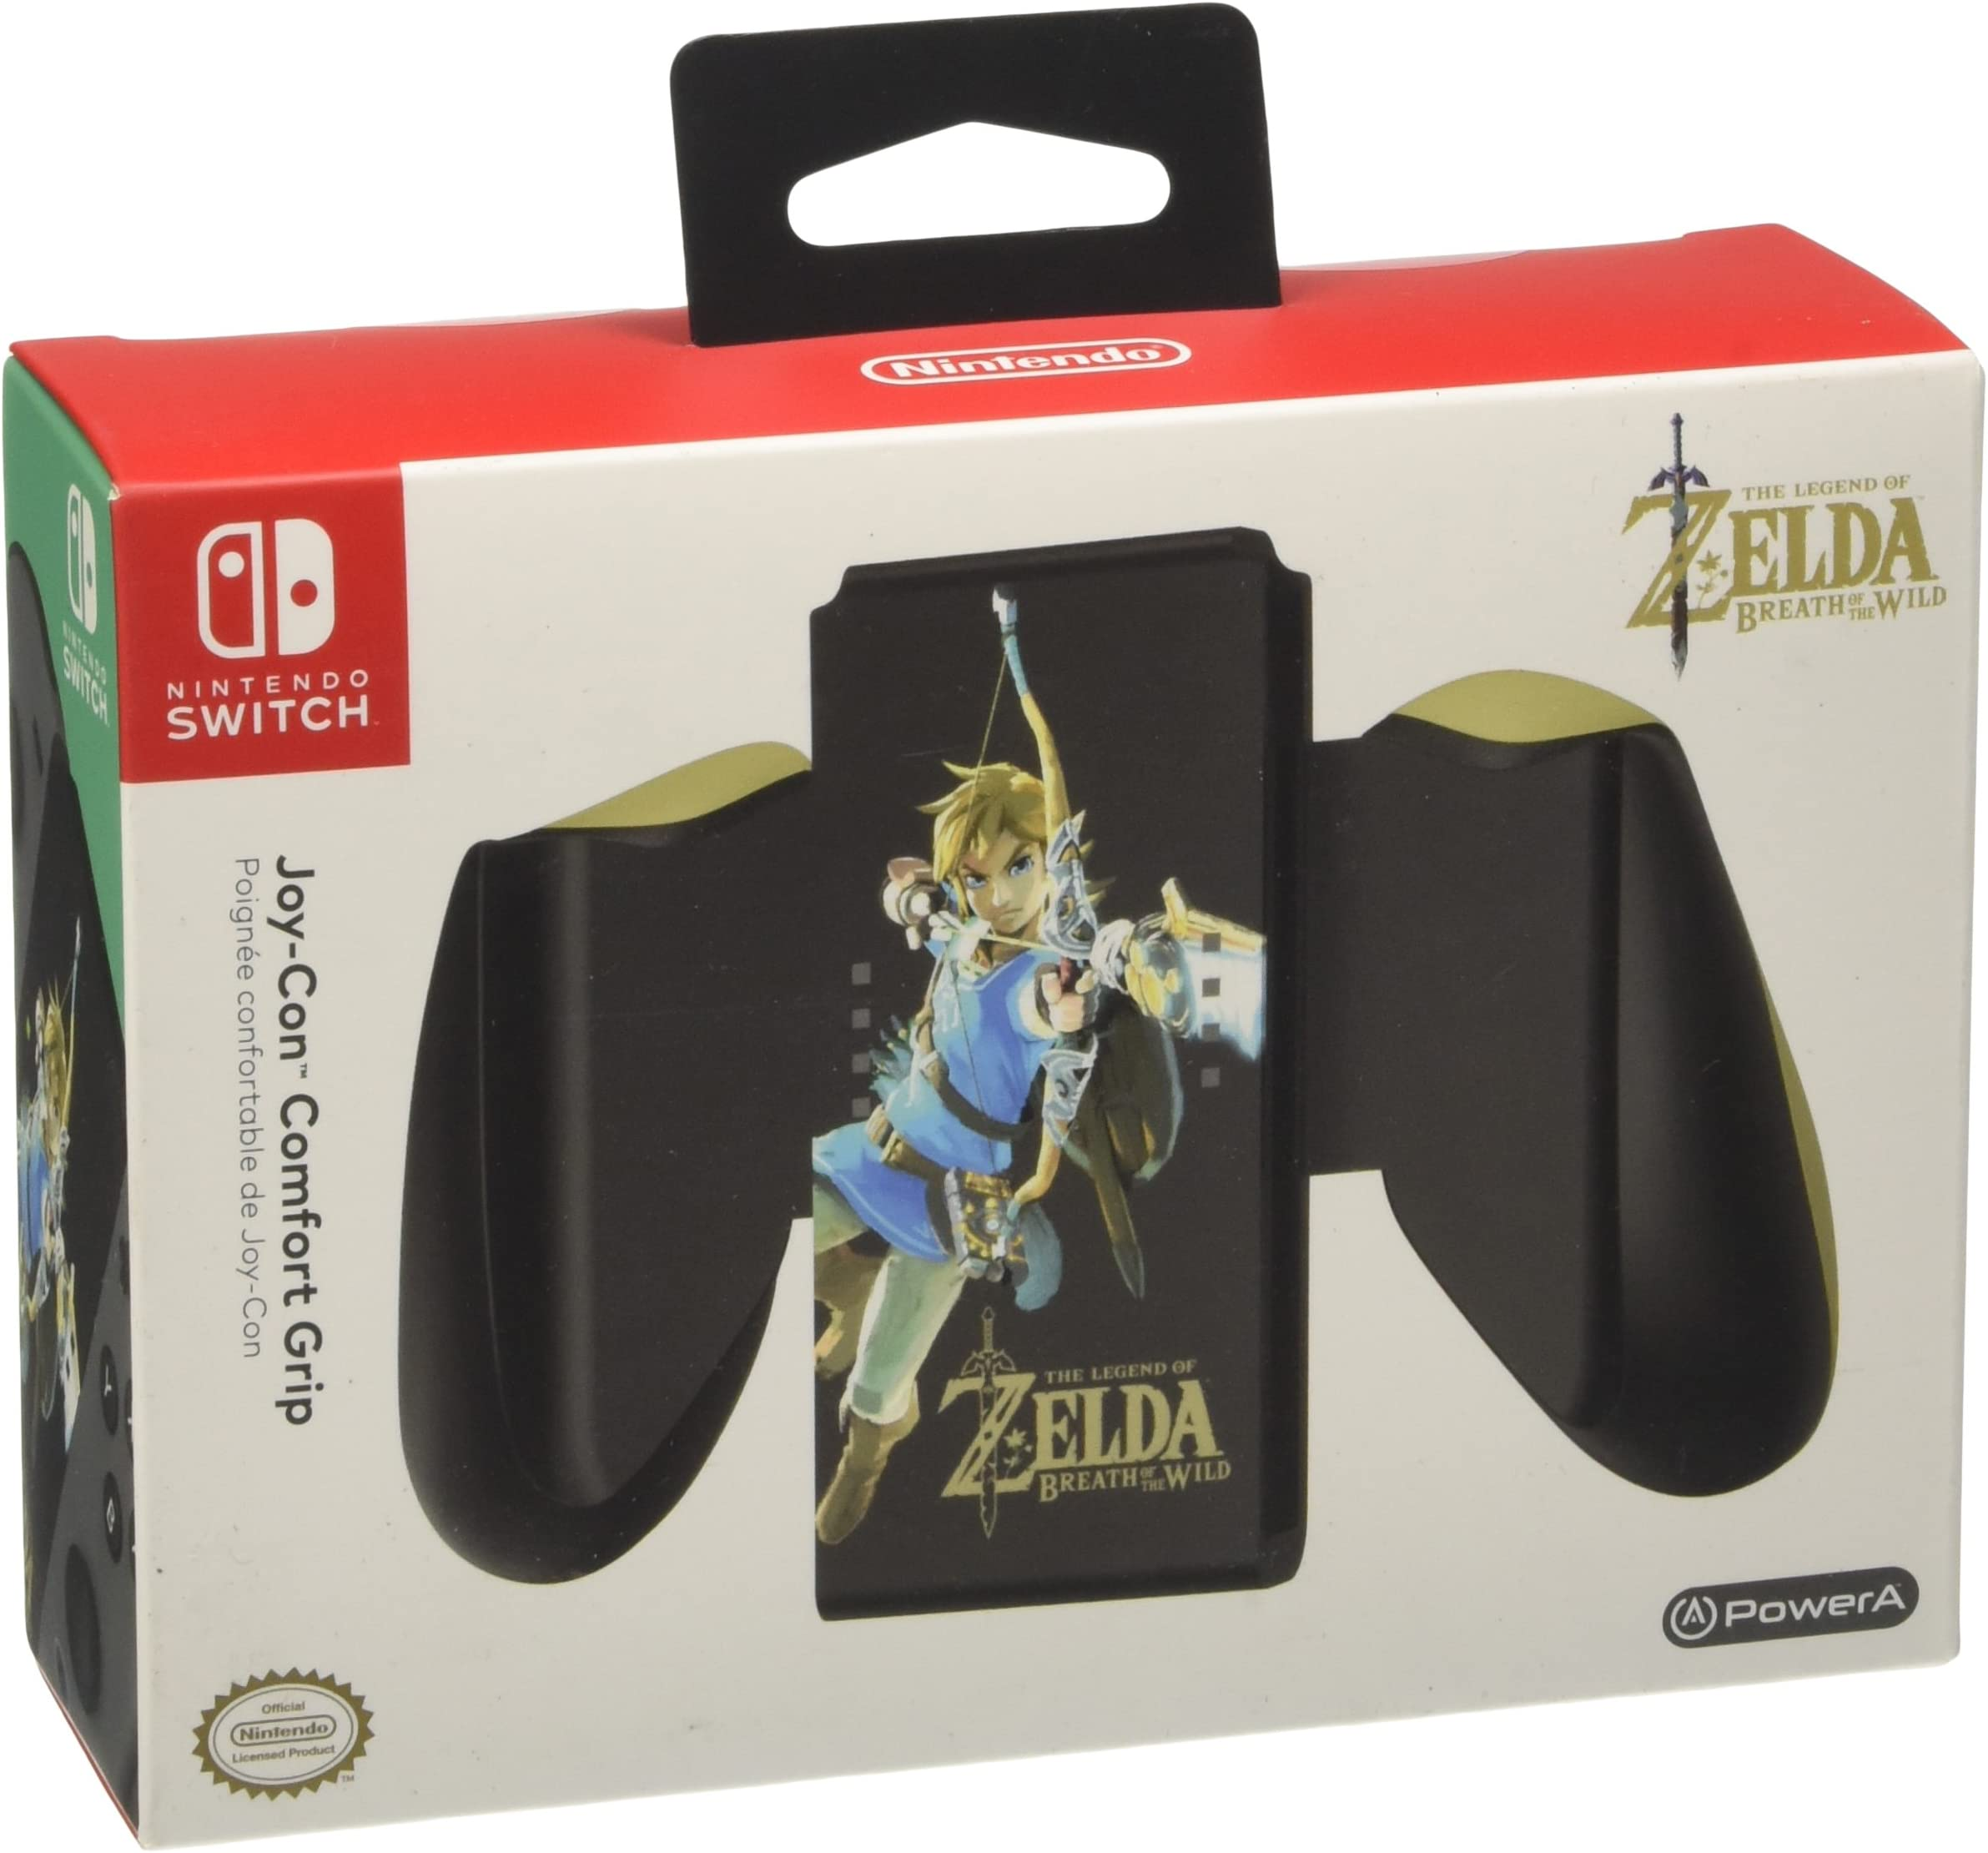 Grips Para Controles De Nintendo Switch Version Zelda (xmp)